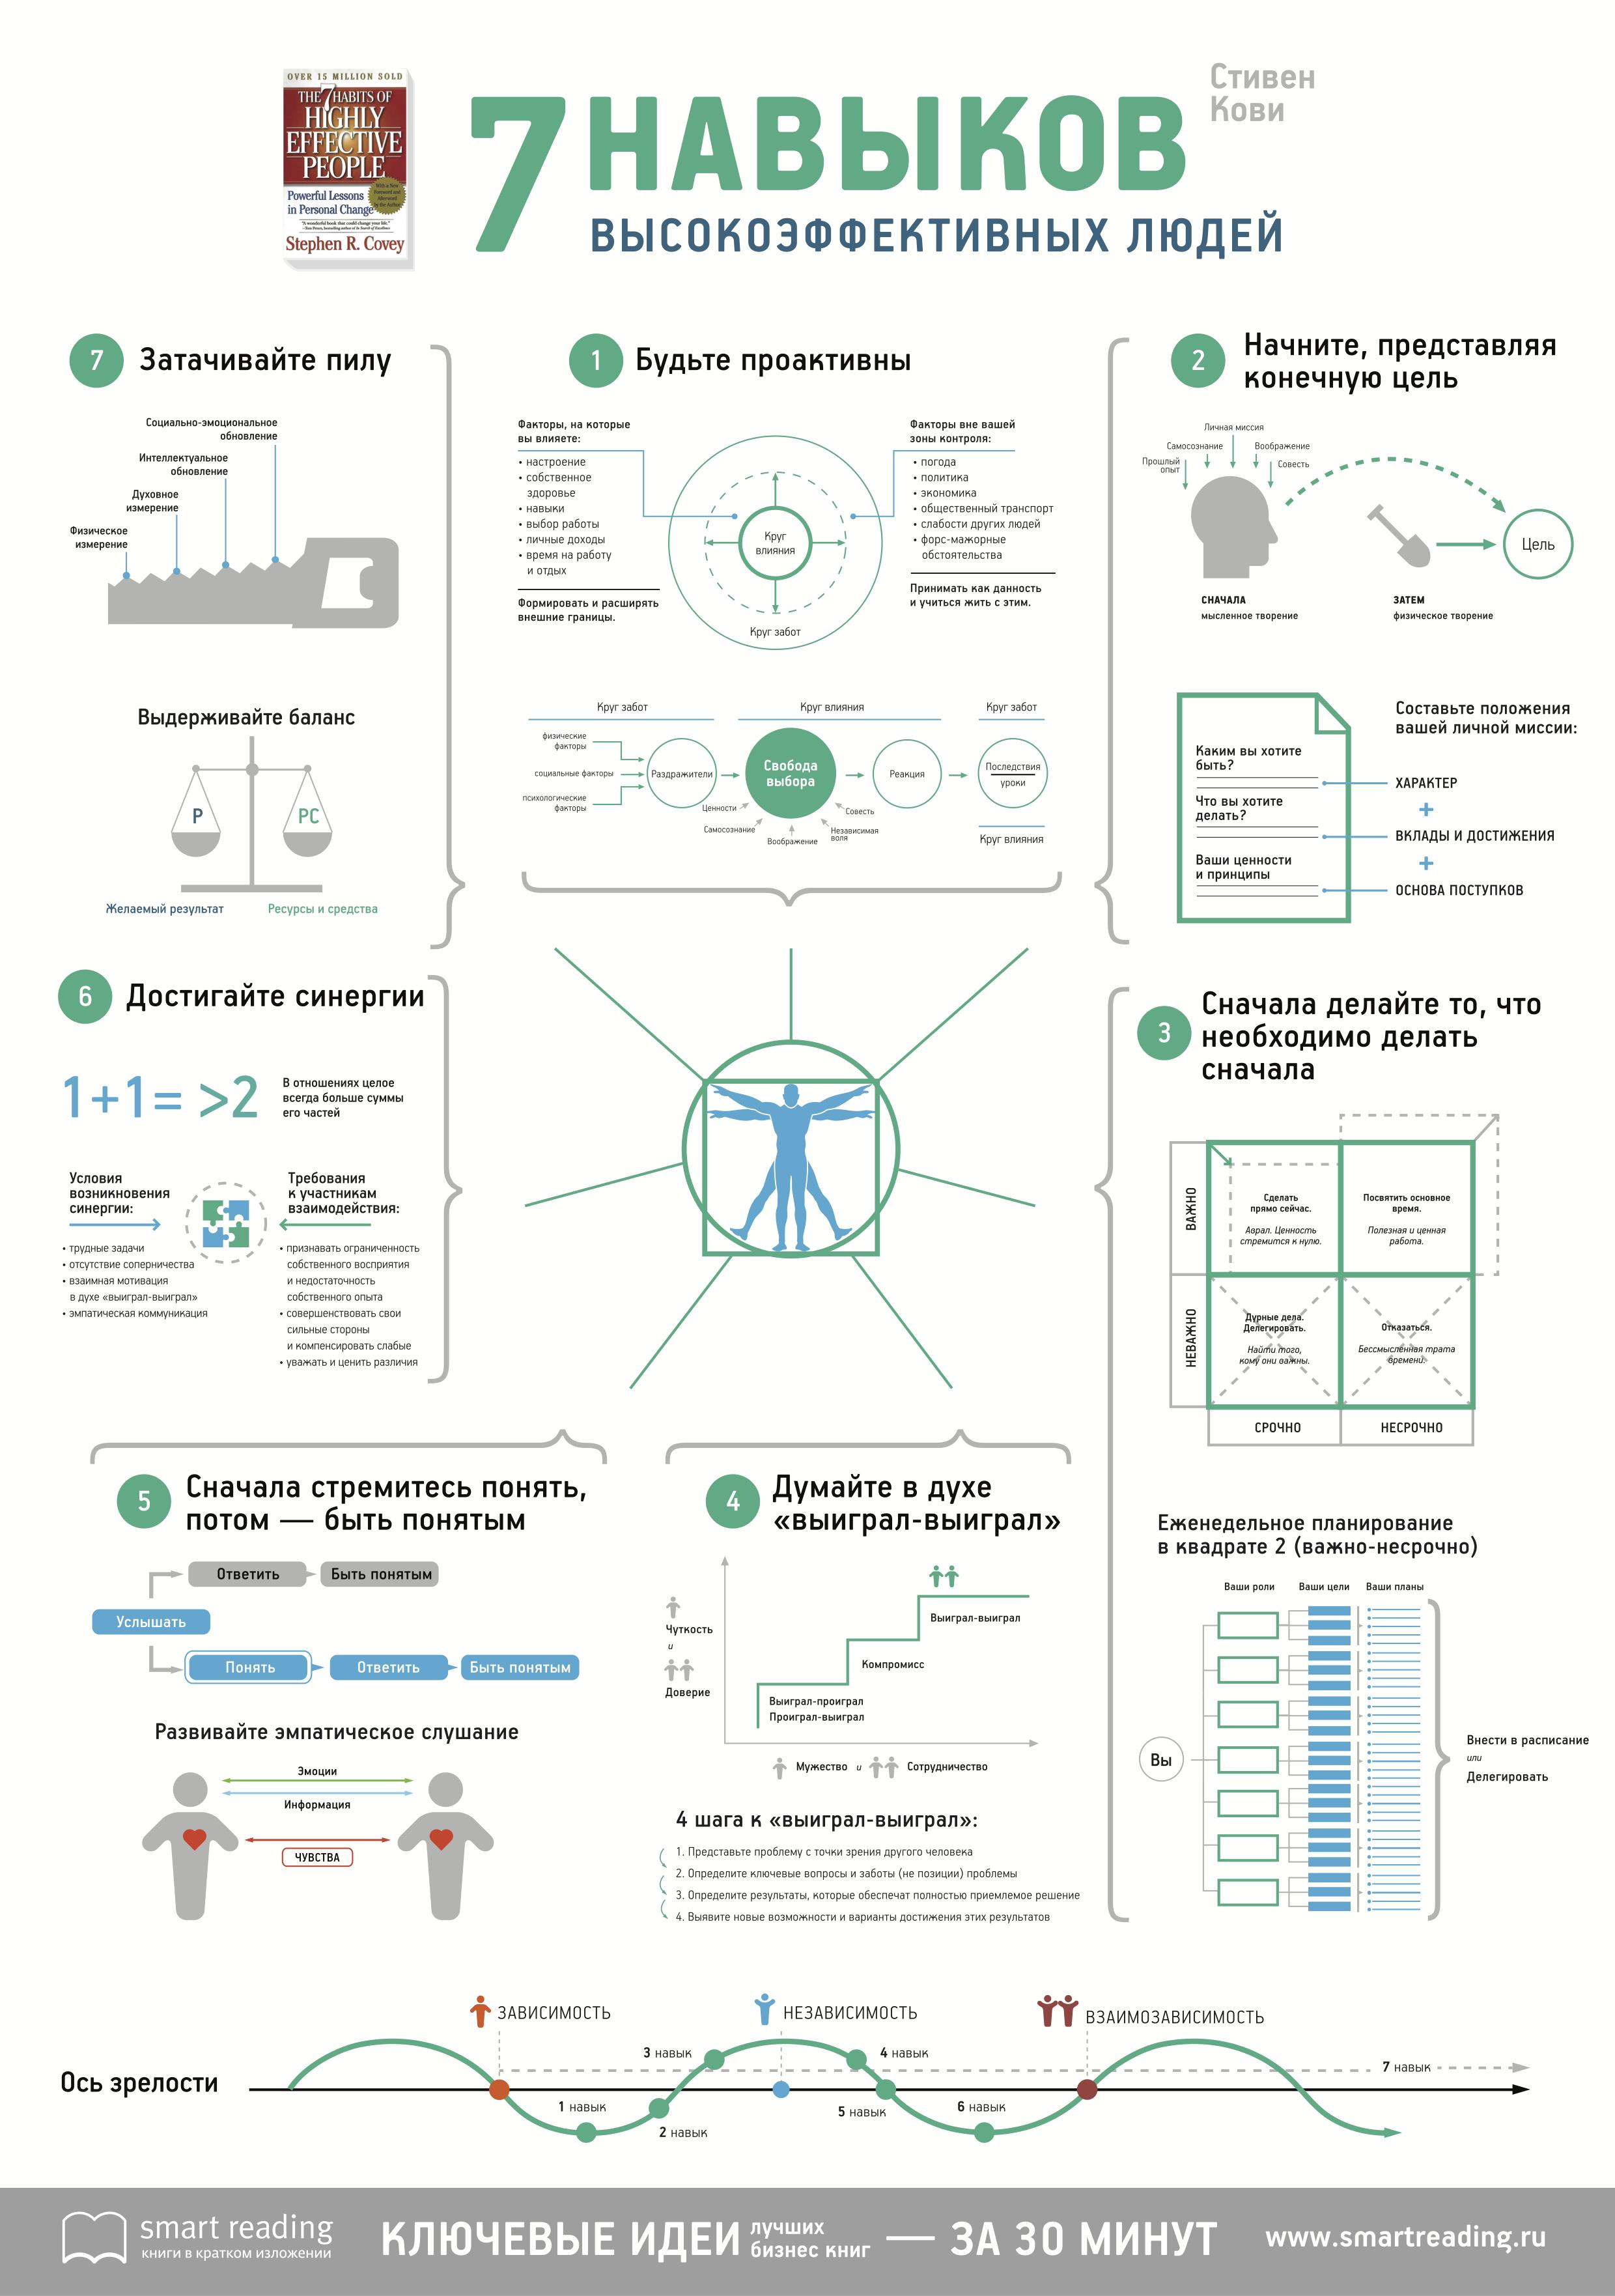 7-navikov-visokoeffektivnih-lydei-infografica